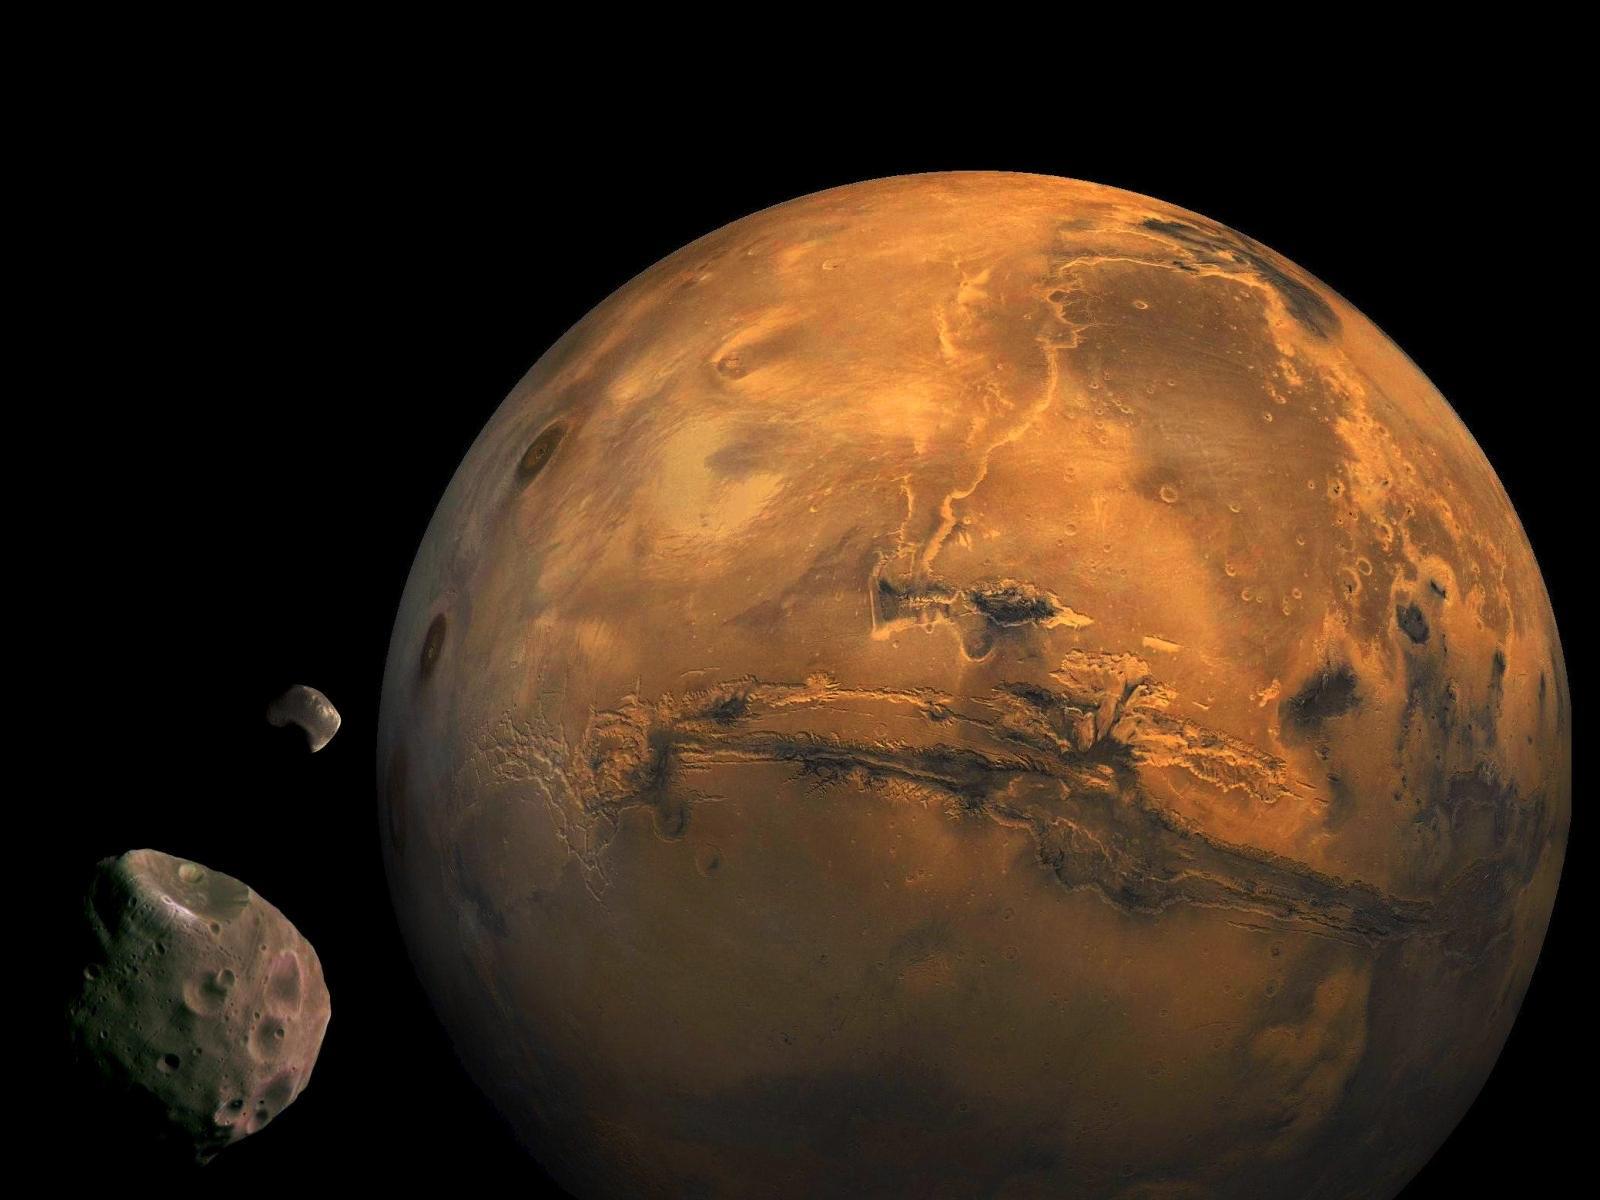 Mercury Planet HD Wallpaper - Pics about space